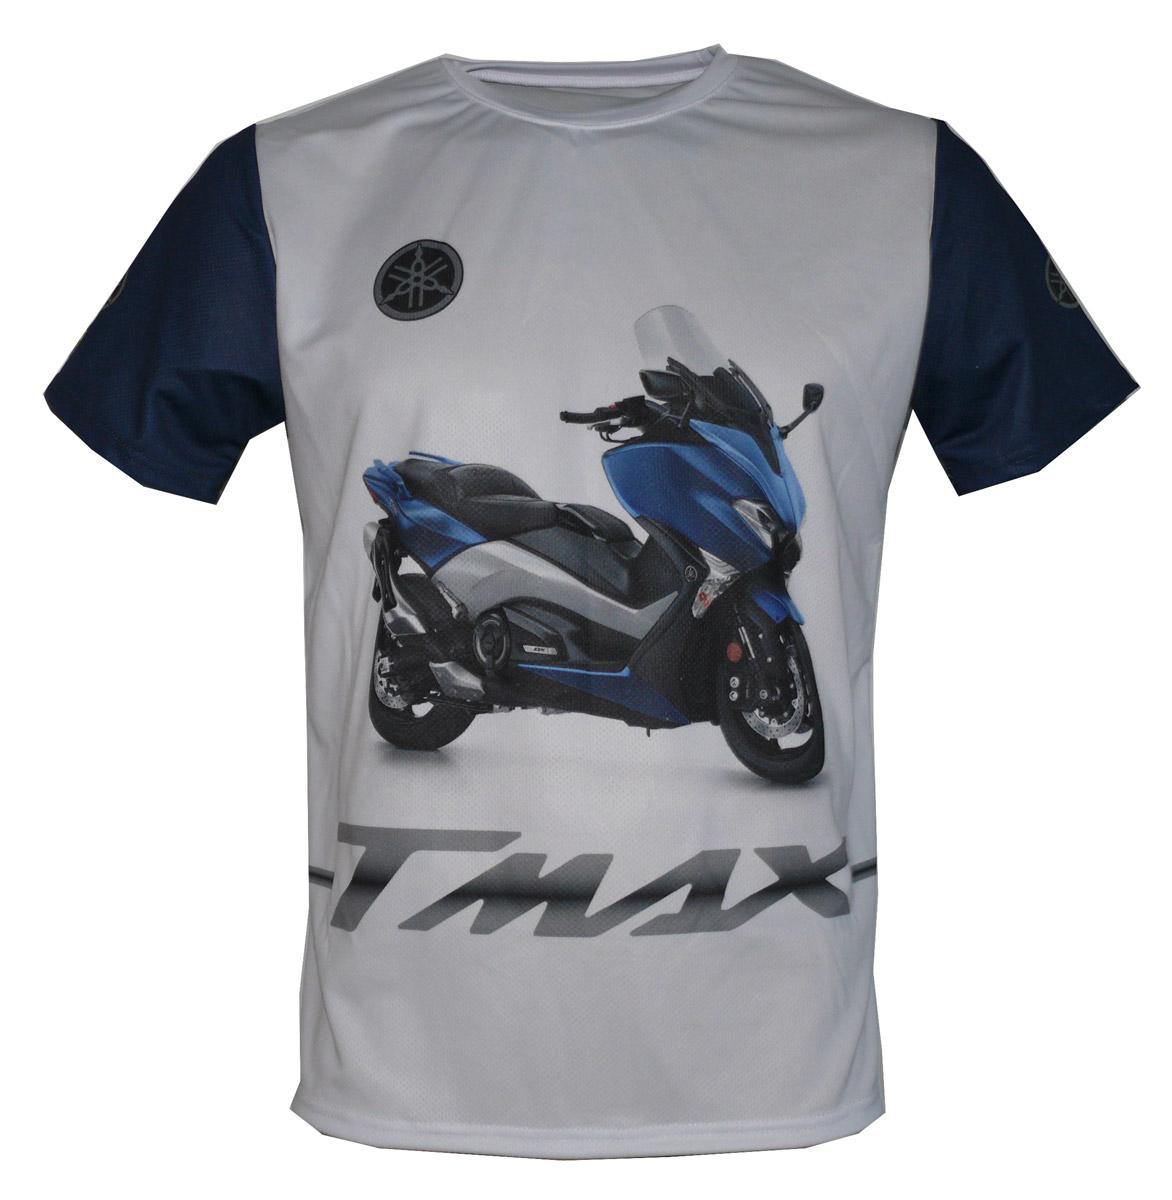 yamaha t max scooter dx 2017 t shirt